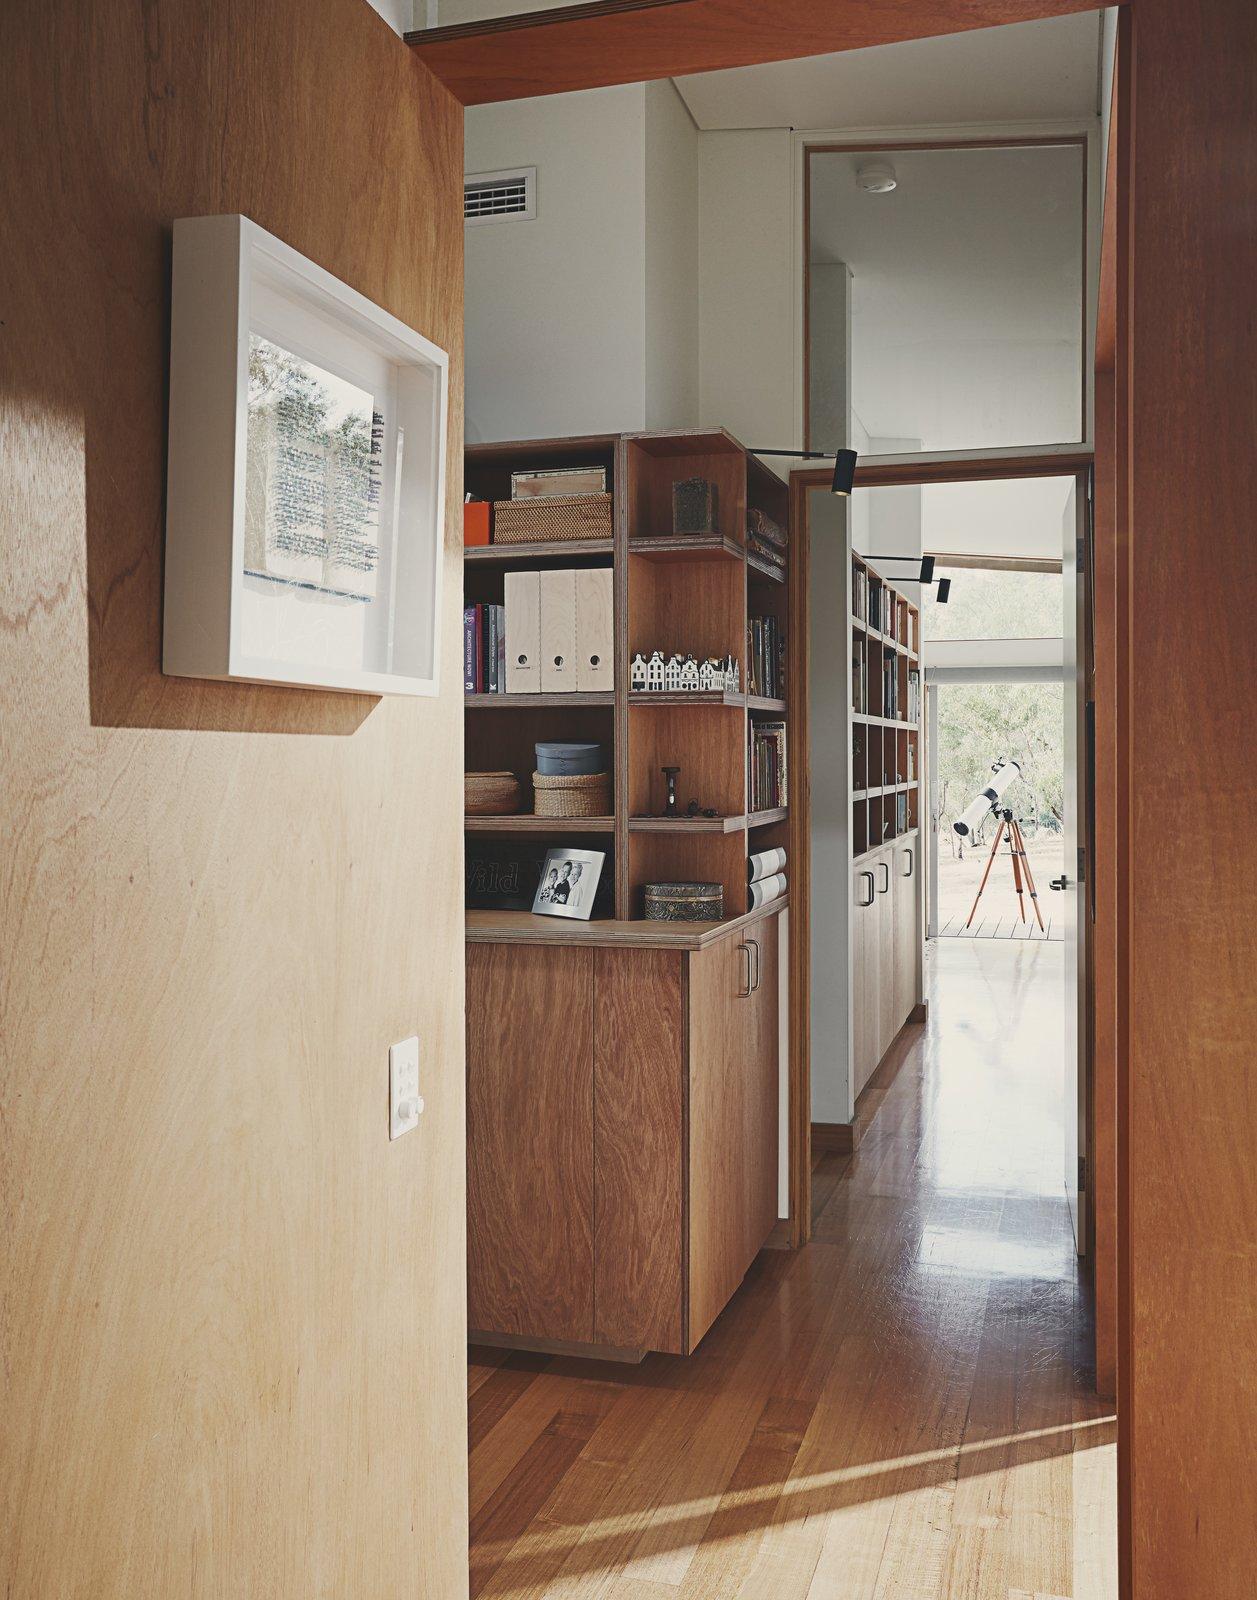 A Workshop - Mindalong Residence  Mindalong by A Workshop - Paul Wakelam Architect